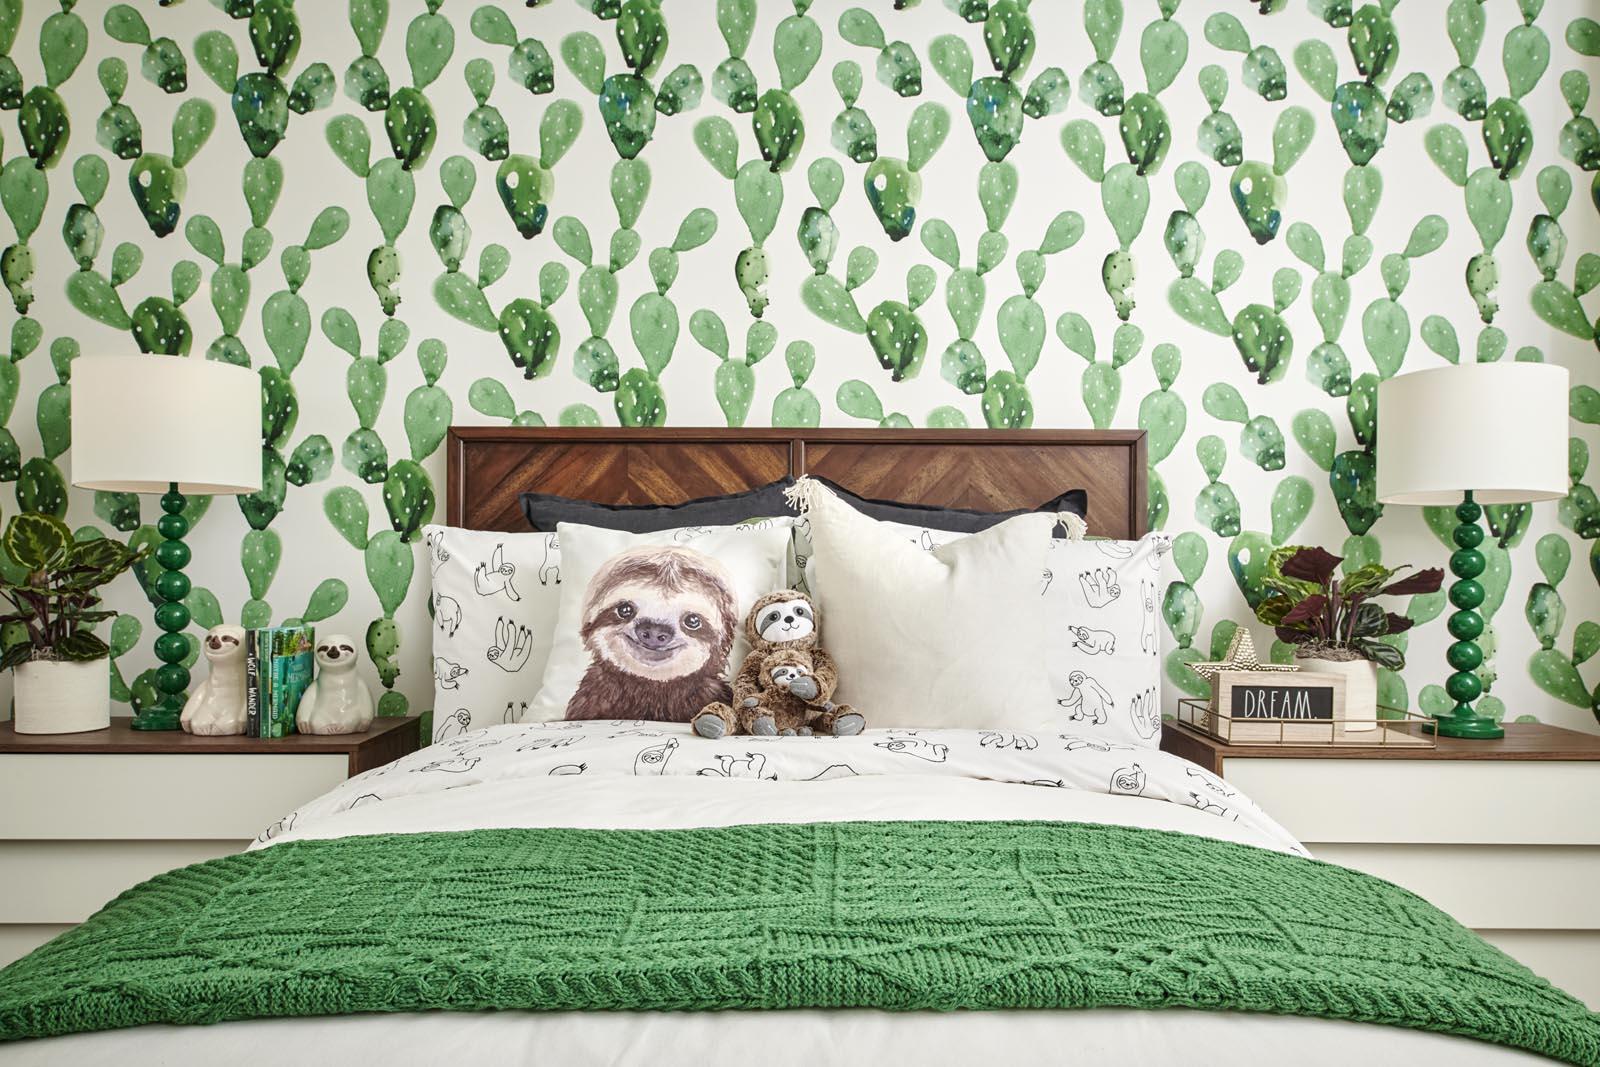 Bedroom | Residence 3 | Enliven | New Homes in Rancho Cucamonga, CA | Van Daele Homes